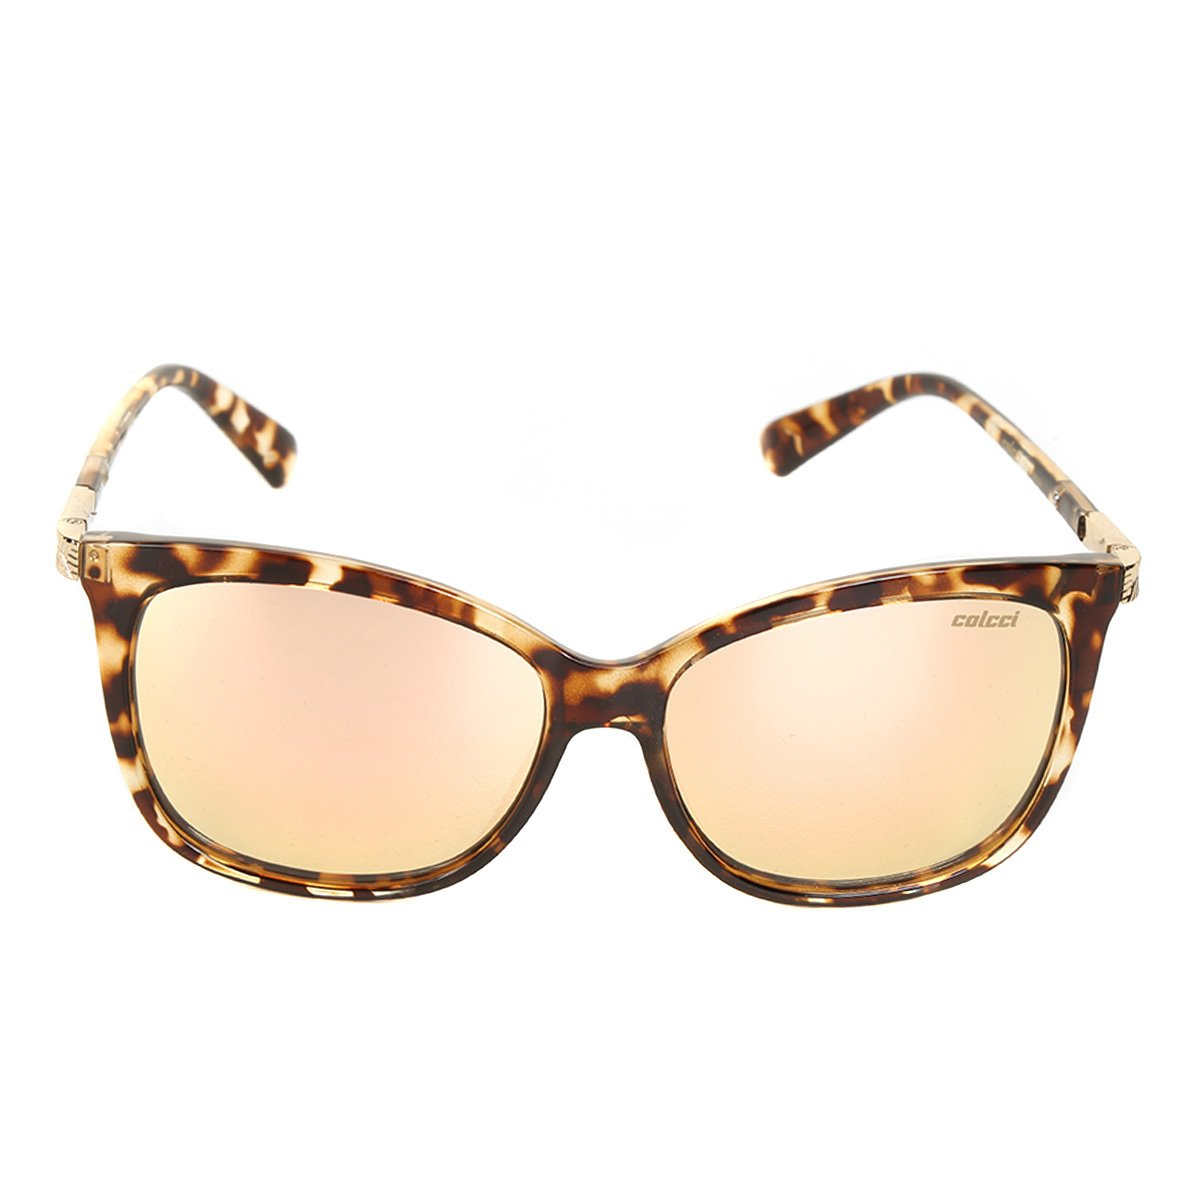 33a65a76ca60b Óculos de Sol Colcci Demi Brilho Feminino - Compre Agora   Netshoes